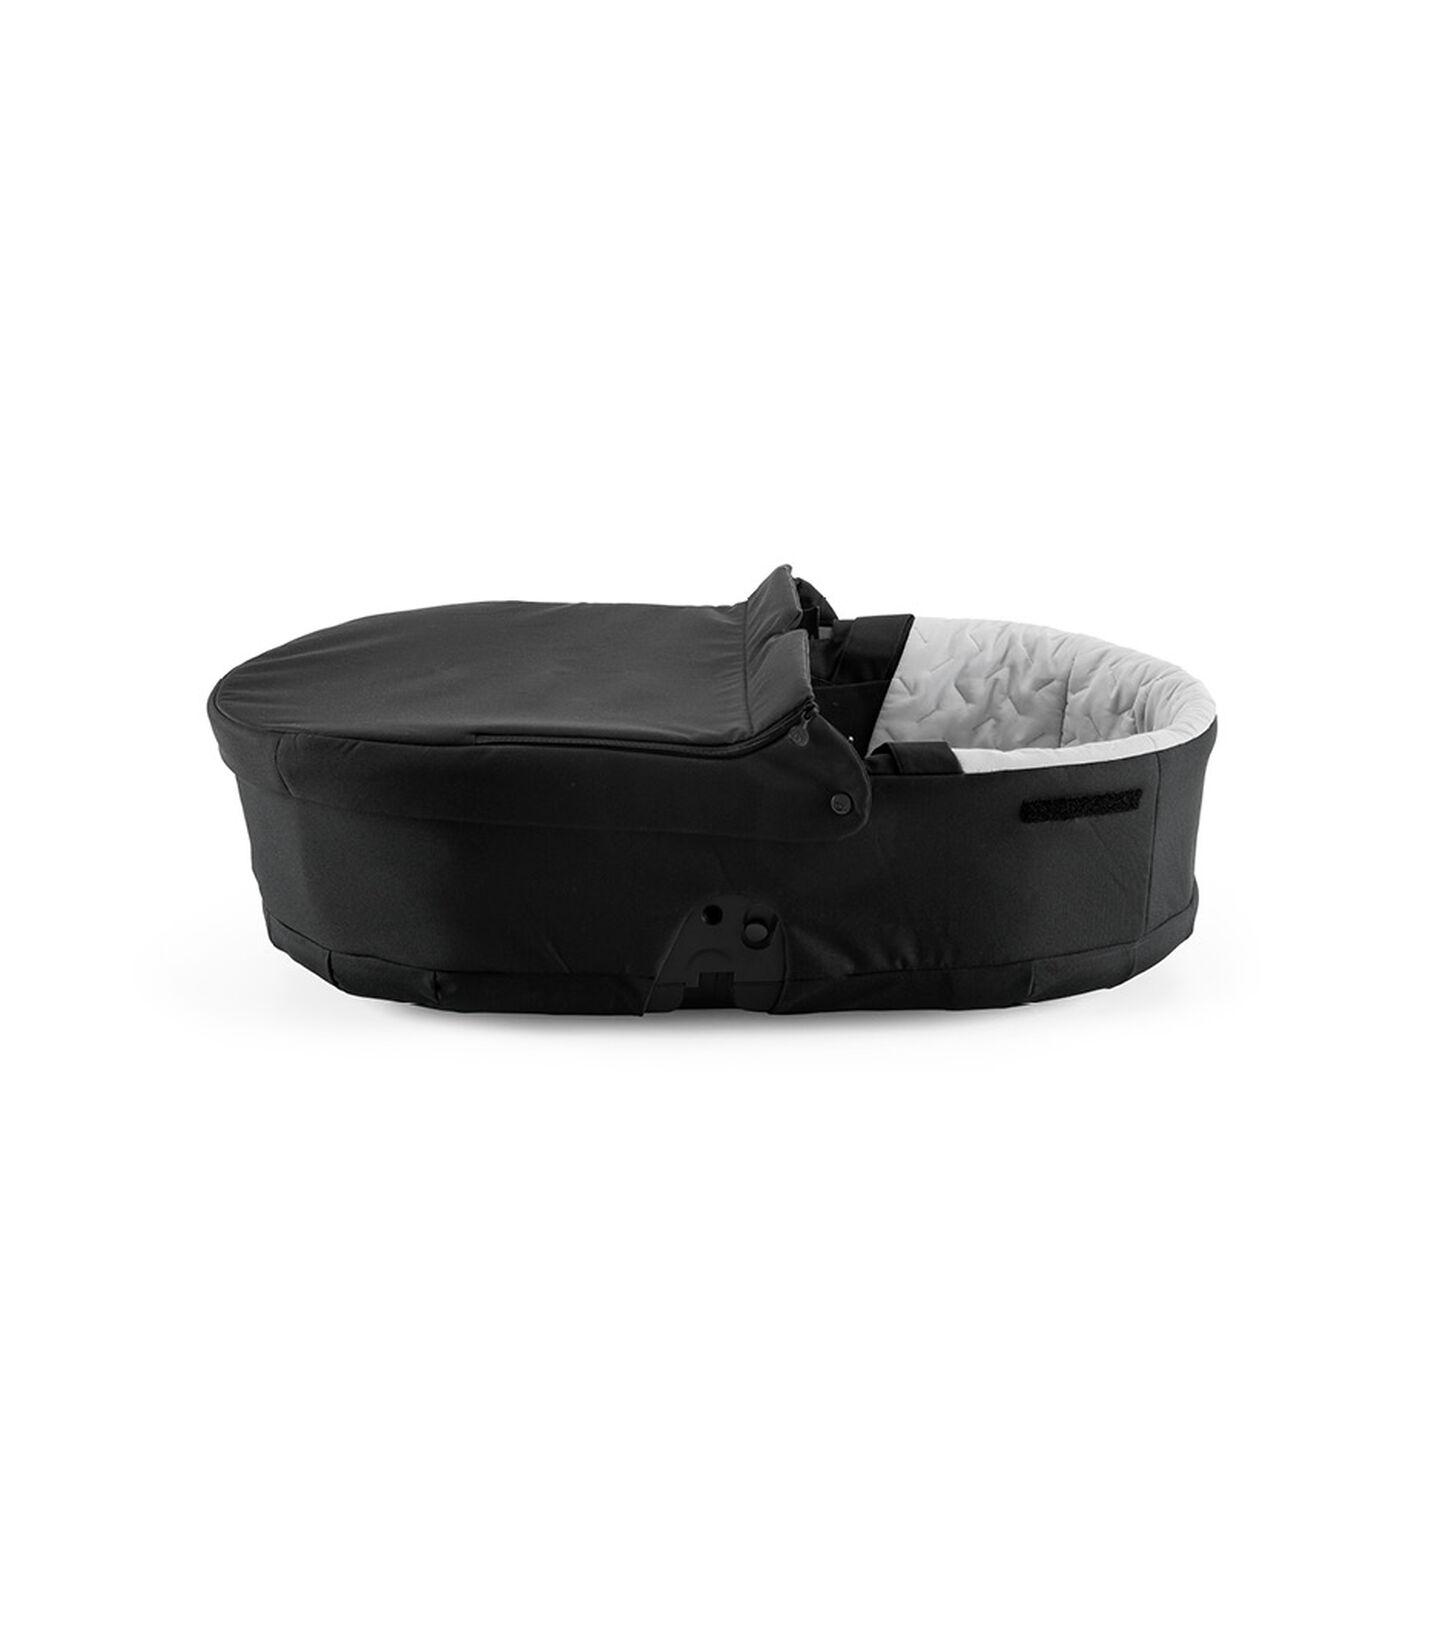 Stokke® Beat™ sparepart. Carry Cot Textile, Black.